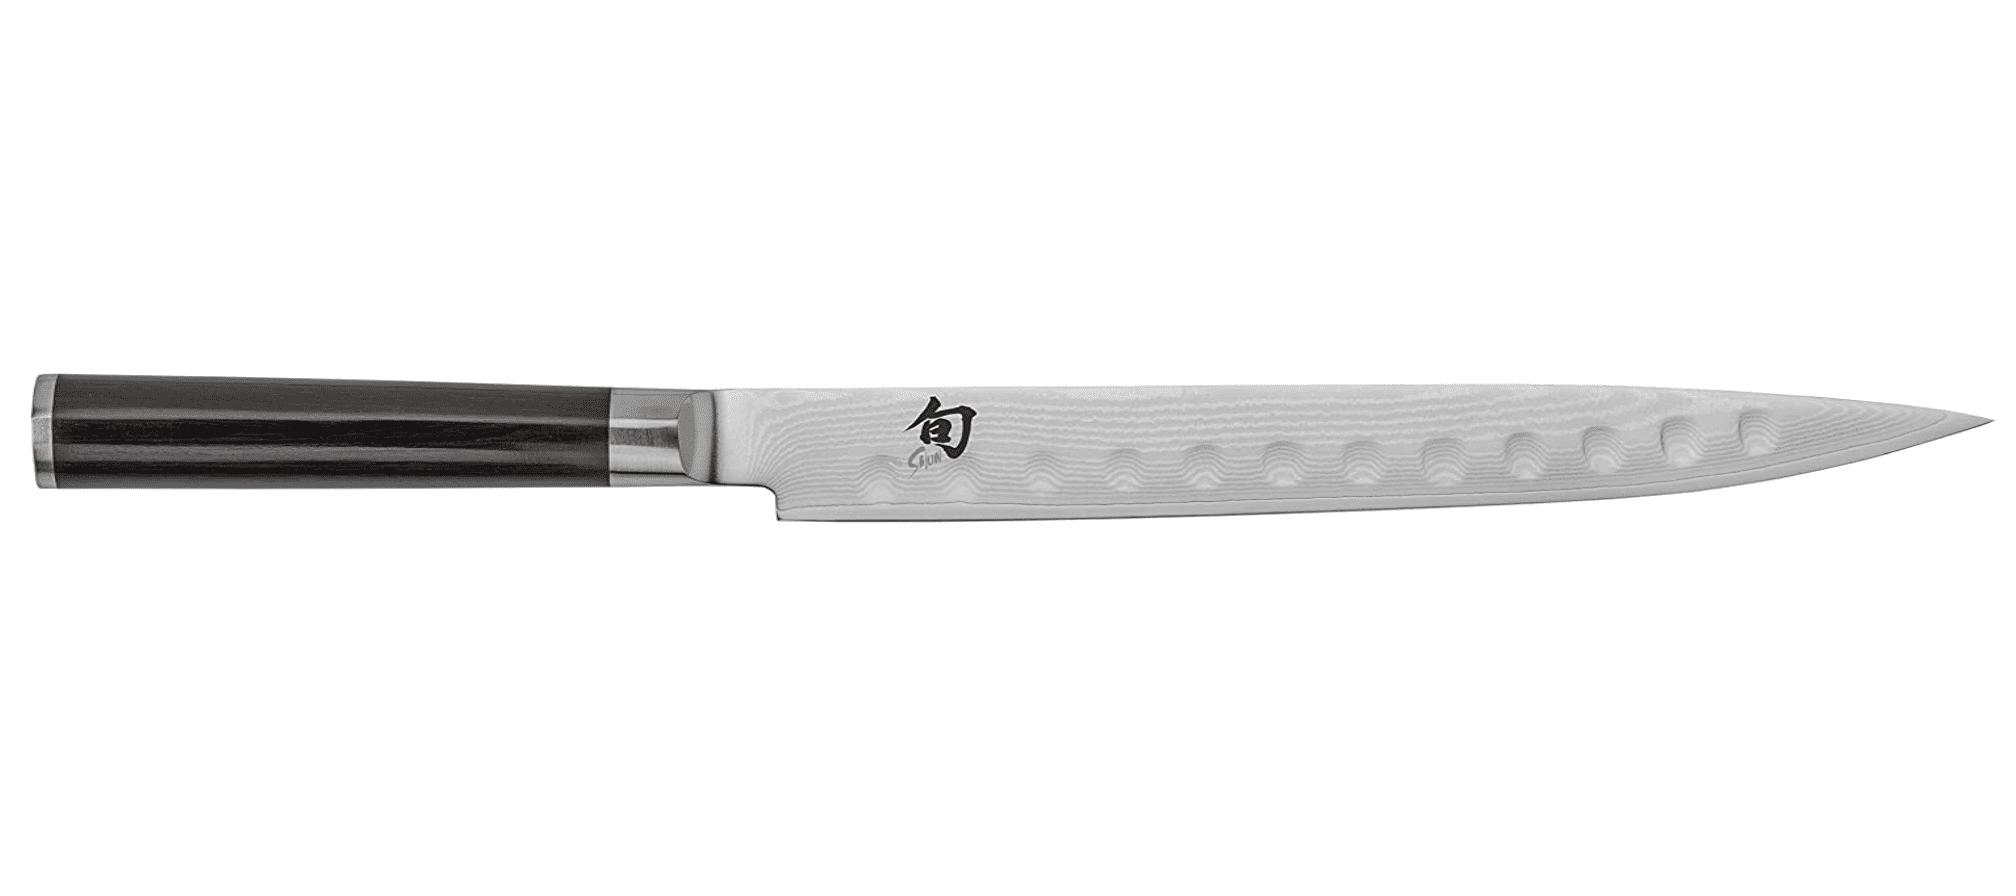 Shun DM-0720 Classic 9-Inch Hollow-Ground Knife